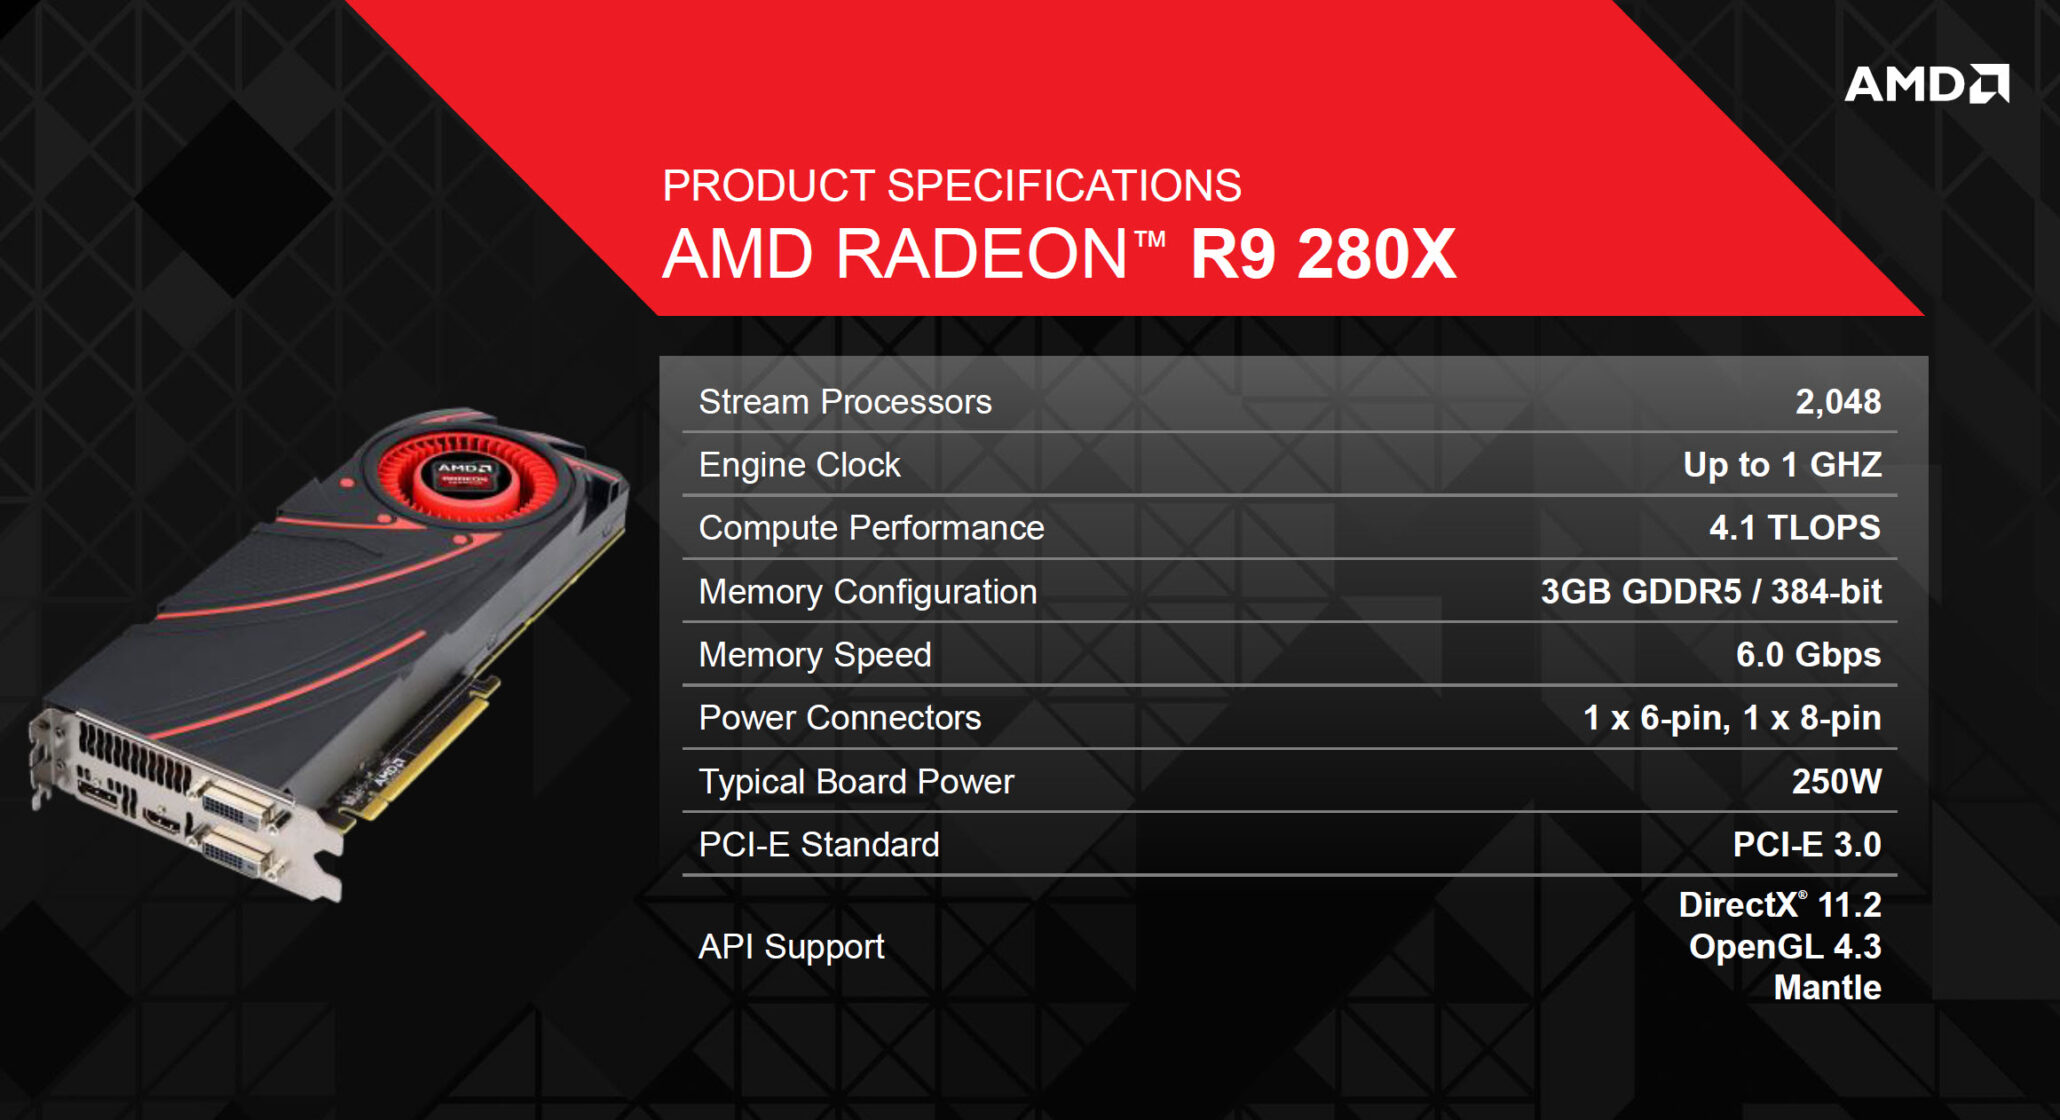 amd-radeon-r9-280x-specifications-2